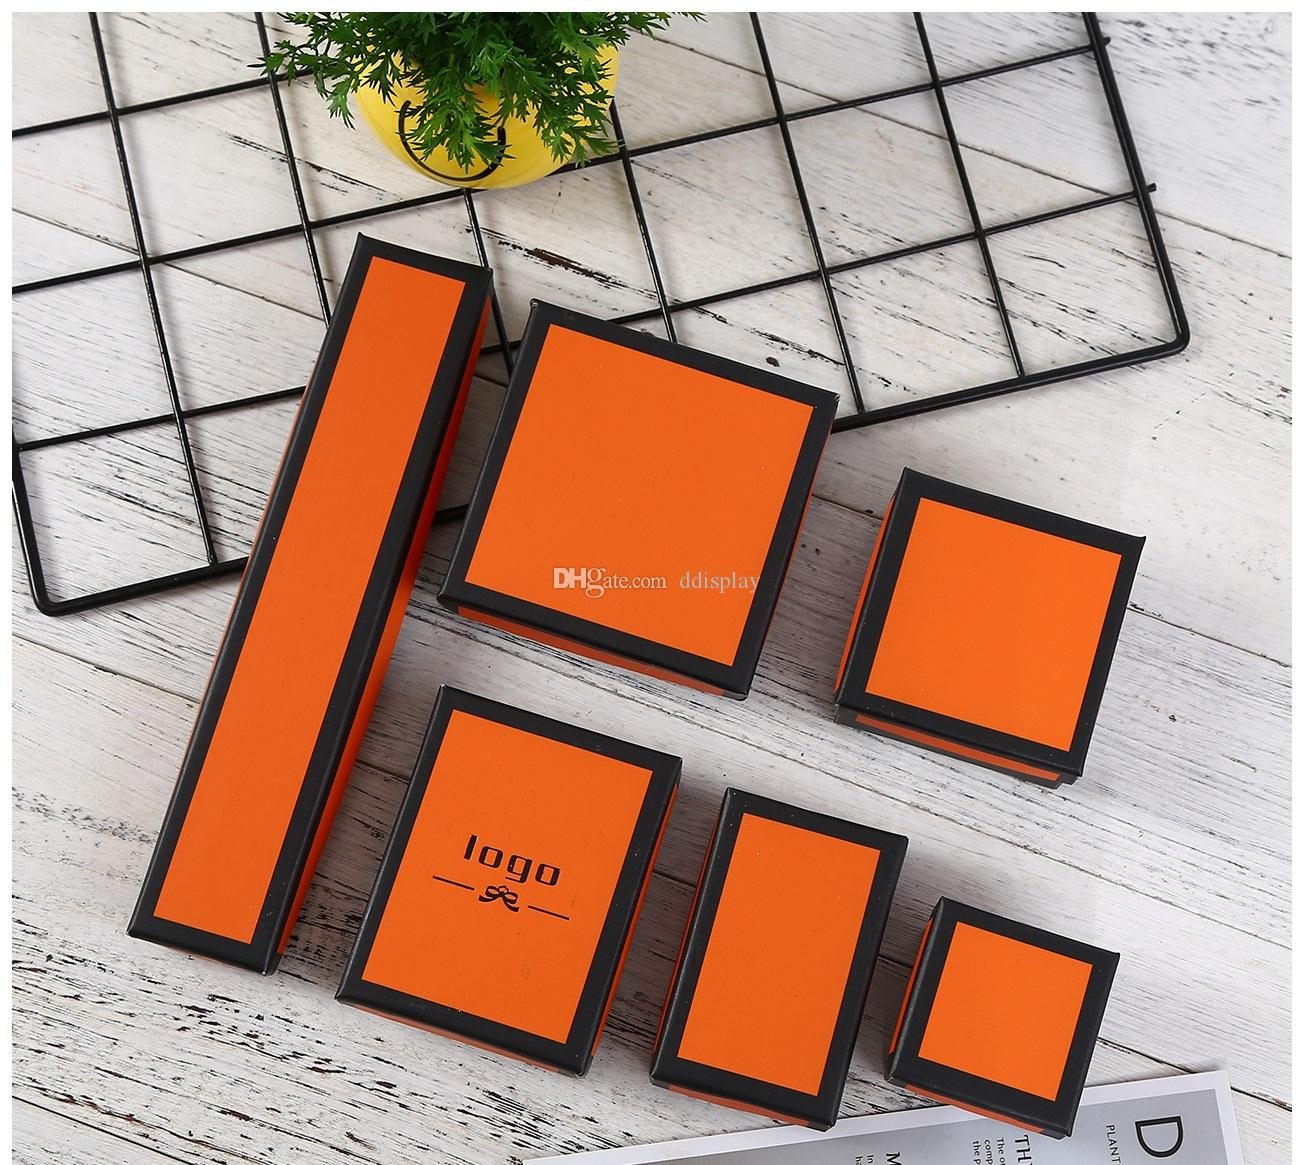 [DDisplay] 크리 에이 티브 OrangeBlack 보석 선물 상자 글 래 머 링 상자 월별 귀걸이 작은 쥬얼리 디스플레이 검은 국경 목걸이 패키지 상자